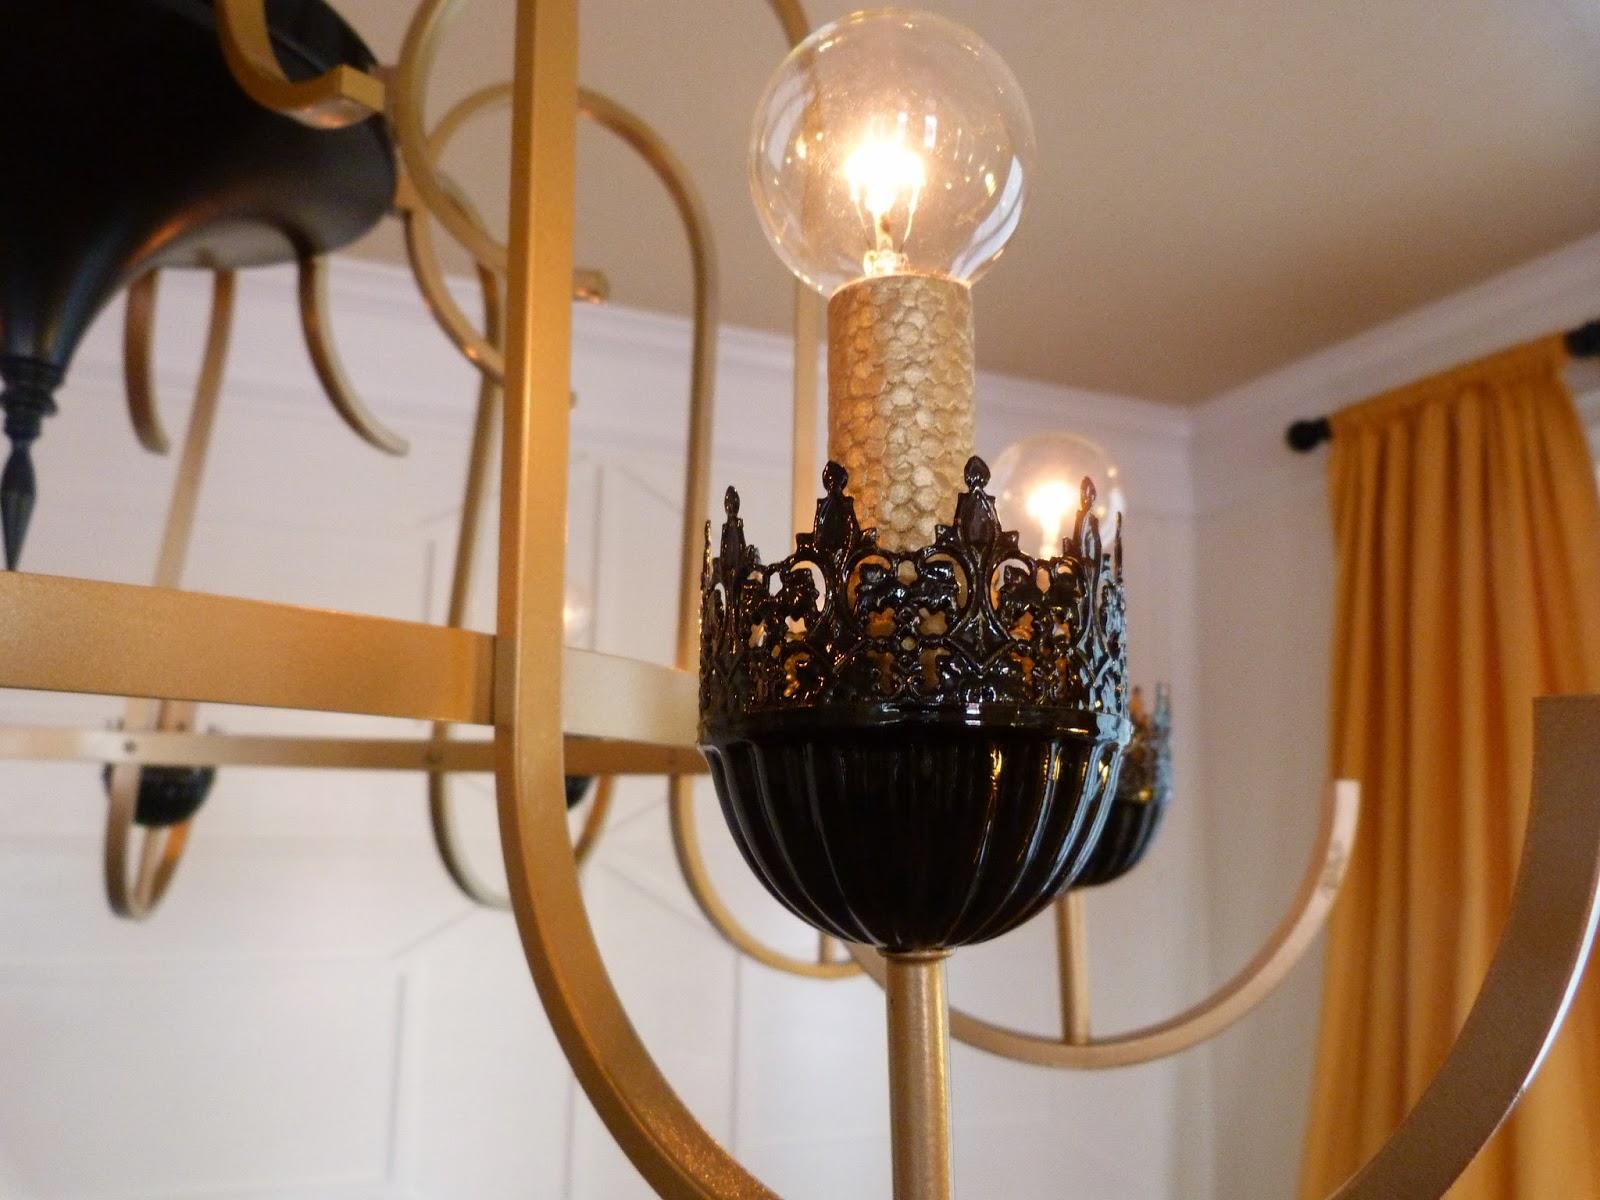 House Envy REVEAL Floor to Ceiling Trim & Chandelier Facelift